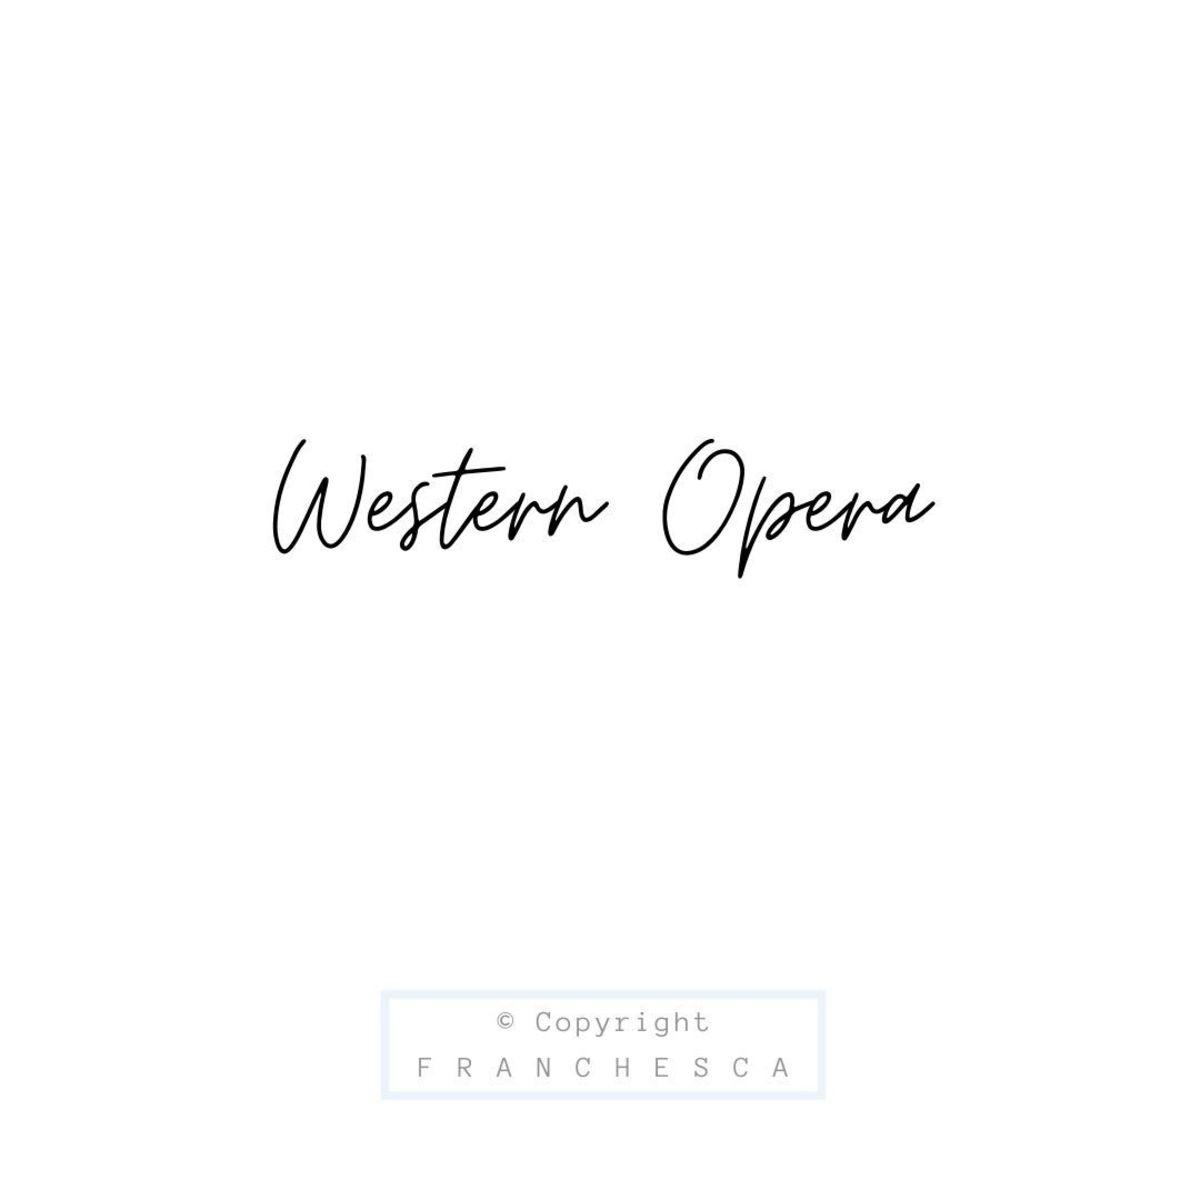 121st Article: Western Opera